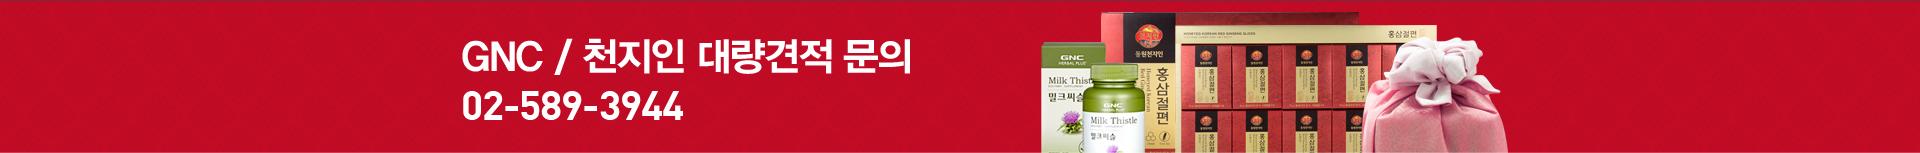 GNC천지인 선물하기 딱 좋은 날 건강한 설맞이 GNC,천지인 홍삼으로 건강을 선물하세요.